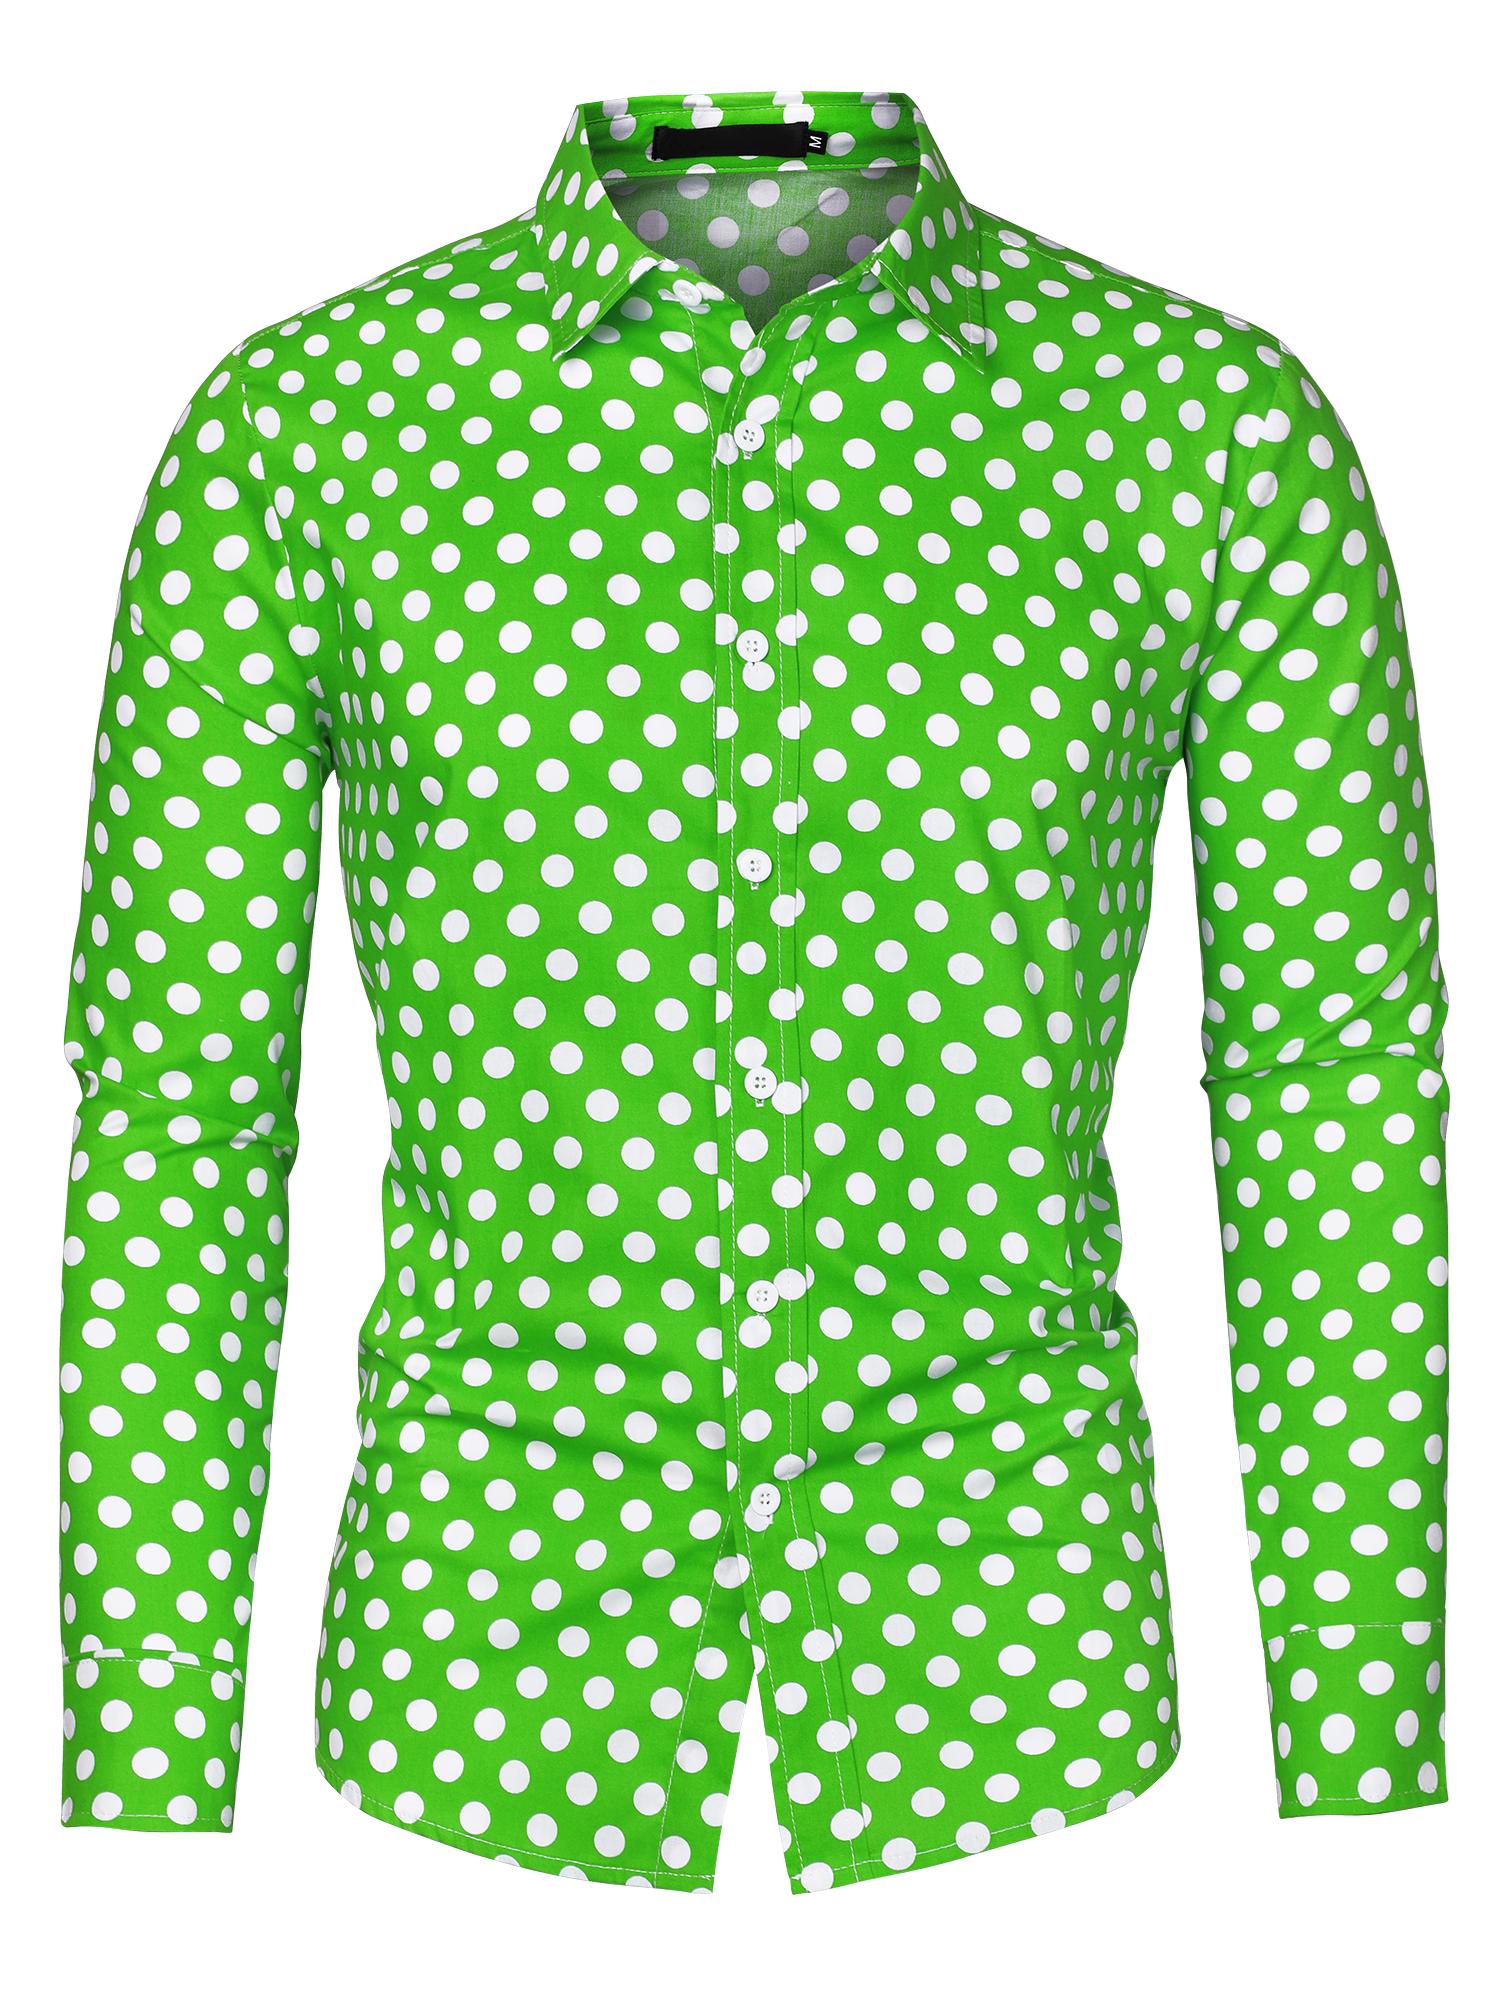 Men 100% Cotton Polka Dots Long Sleeve Slim Fit Dress Shirt Green 42